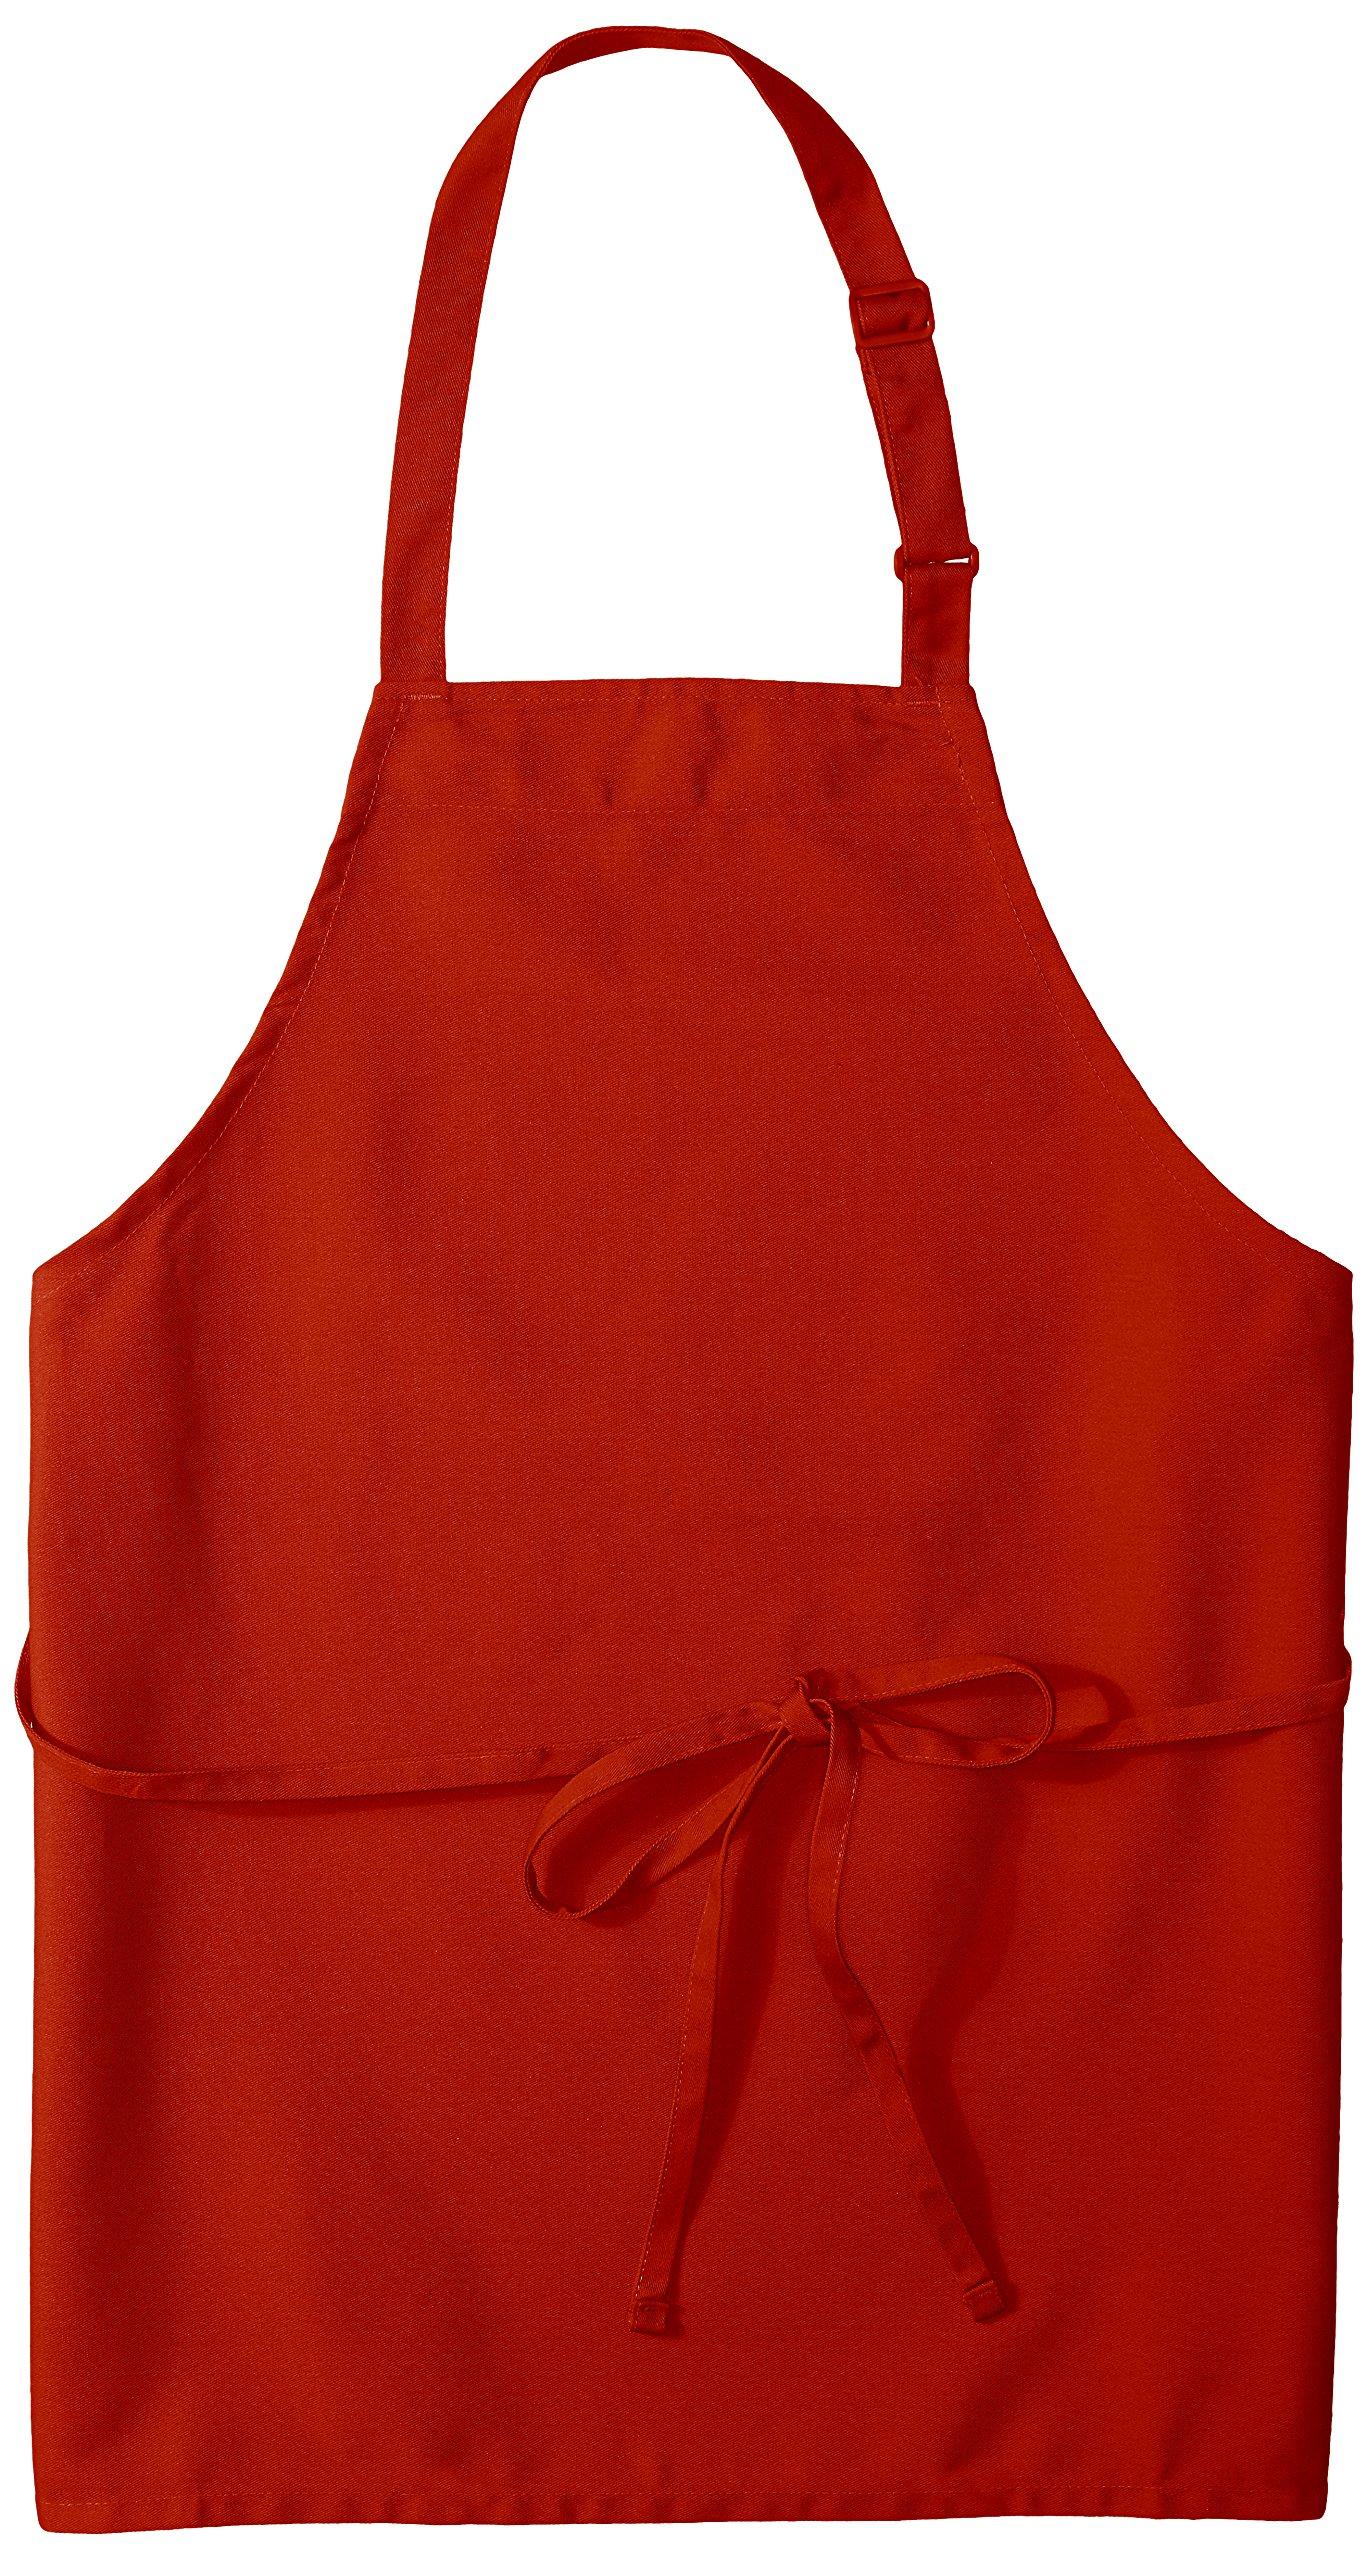 Uncommon Threads Unisex Adjustable No Pocket Restaurant Bib Apron, Red, One Size